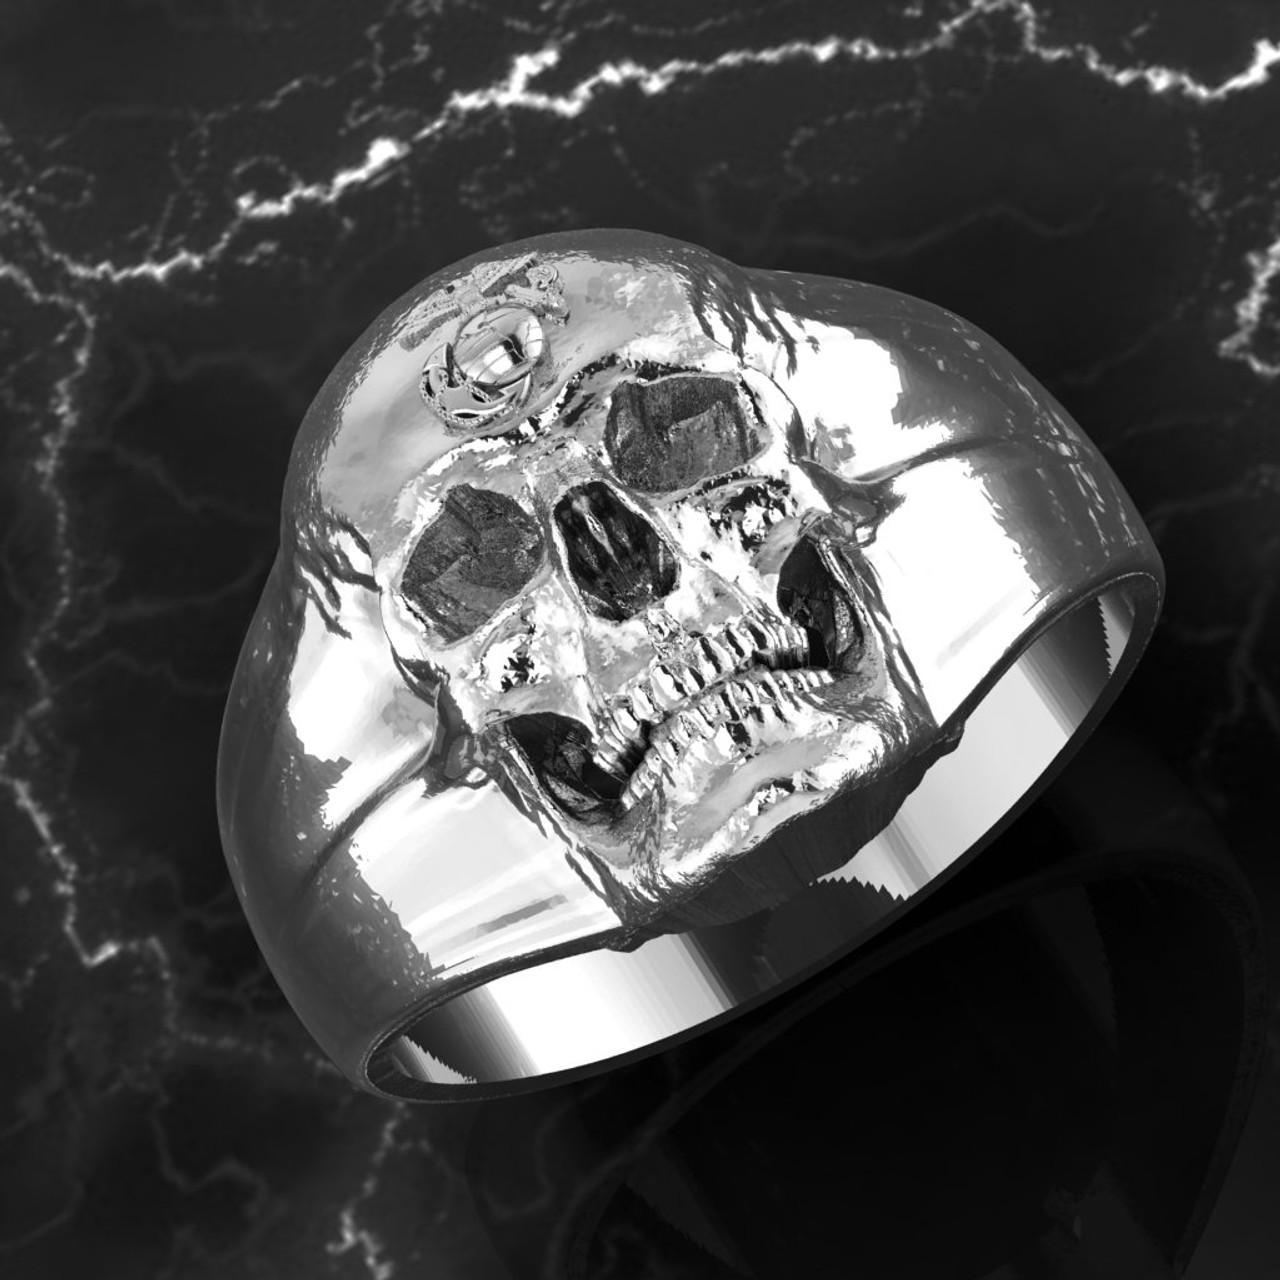 USMC Eagle Globe & Anchor Skull Ring in Solid Sterling Silver